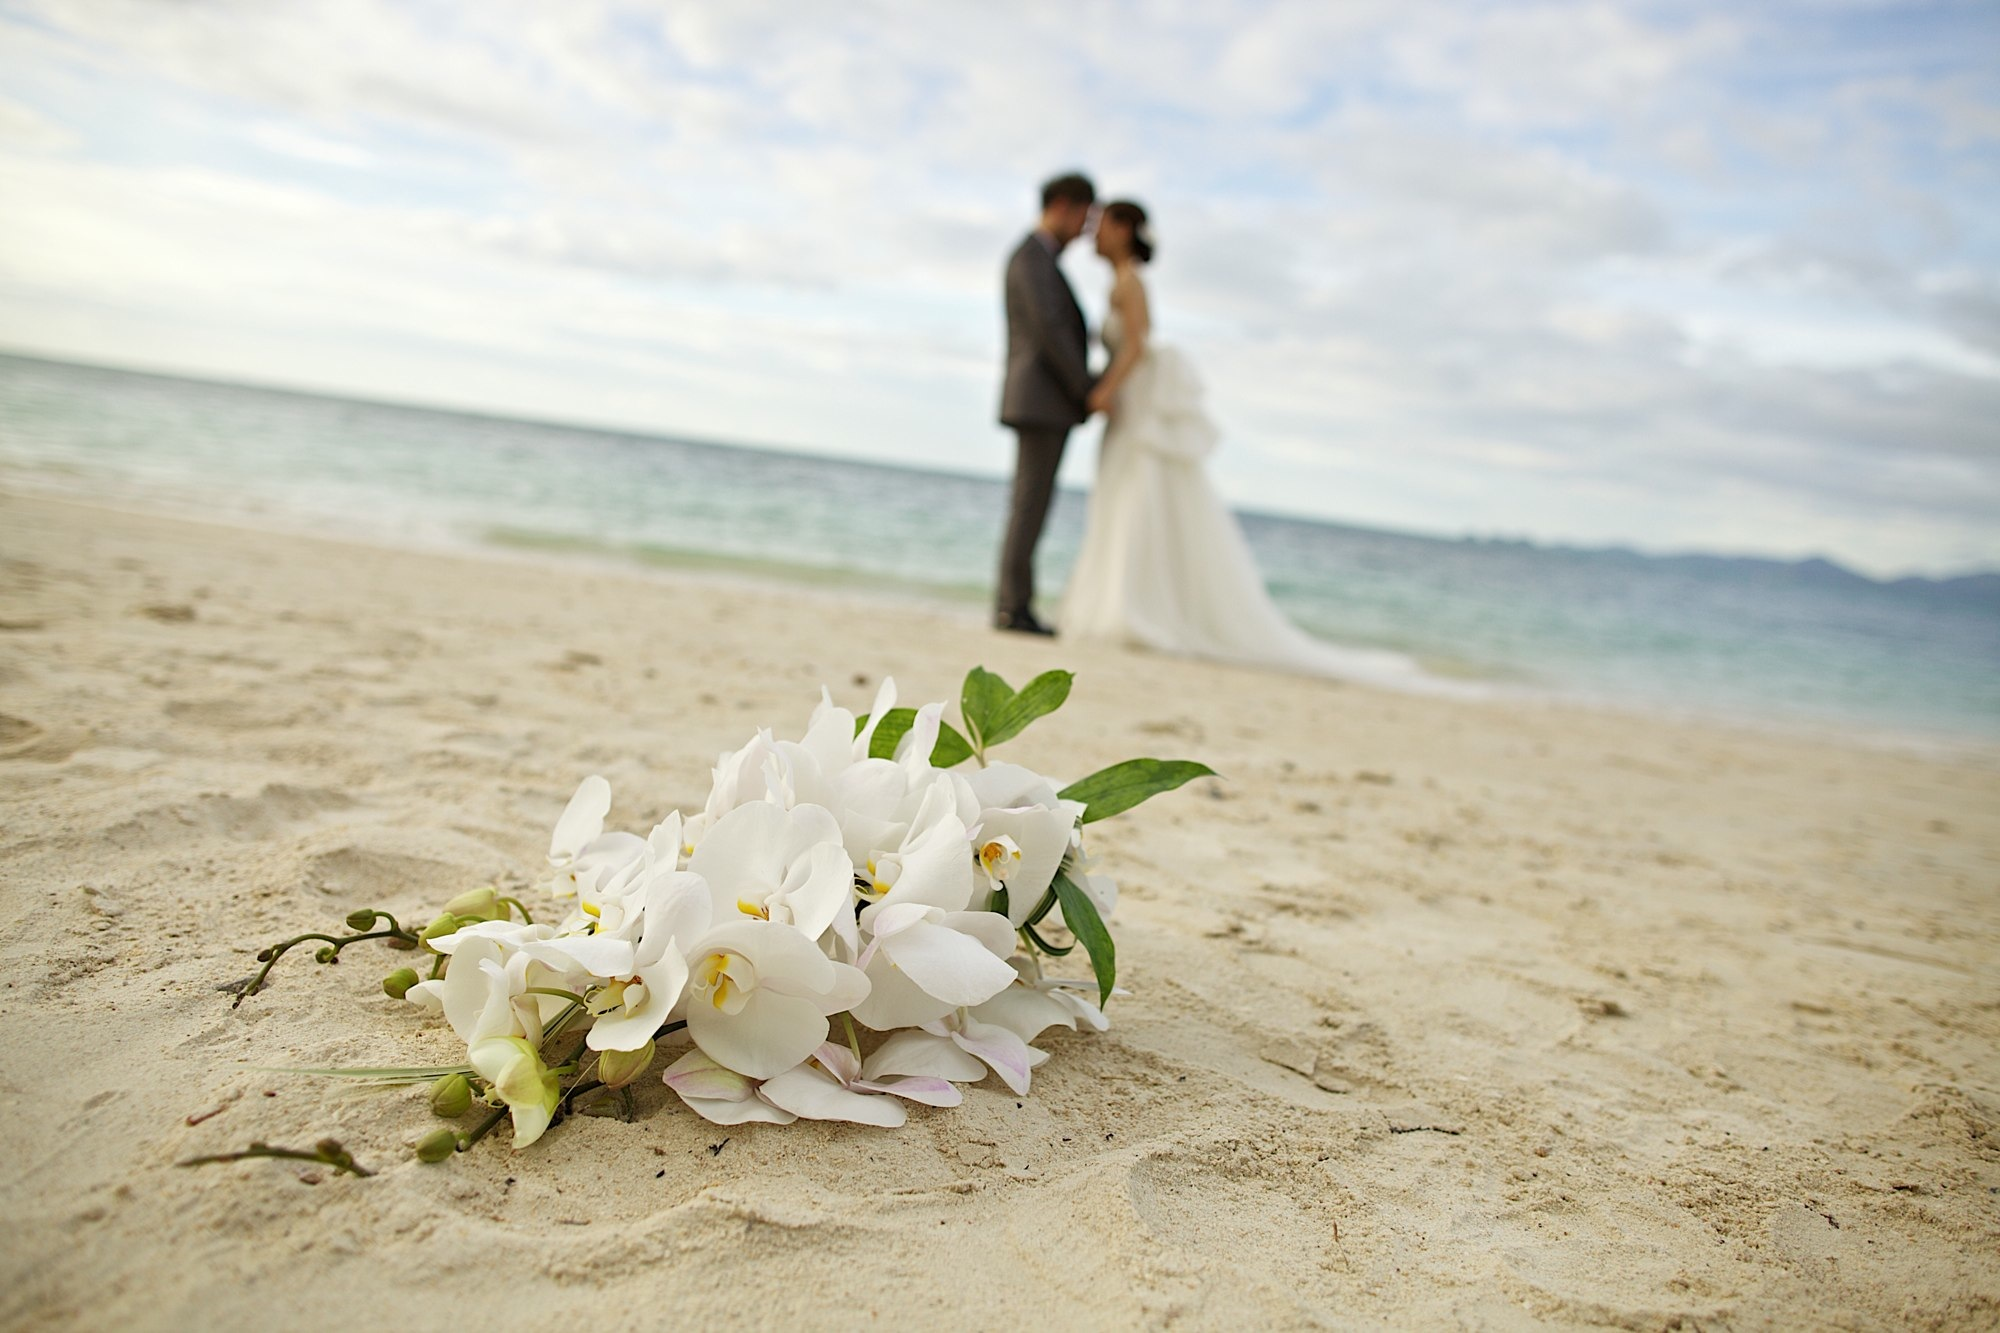 Unique Beach Weddings in Phuket - akyra Beach Club Phuket